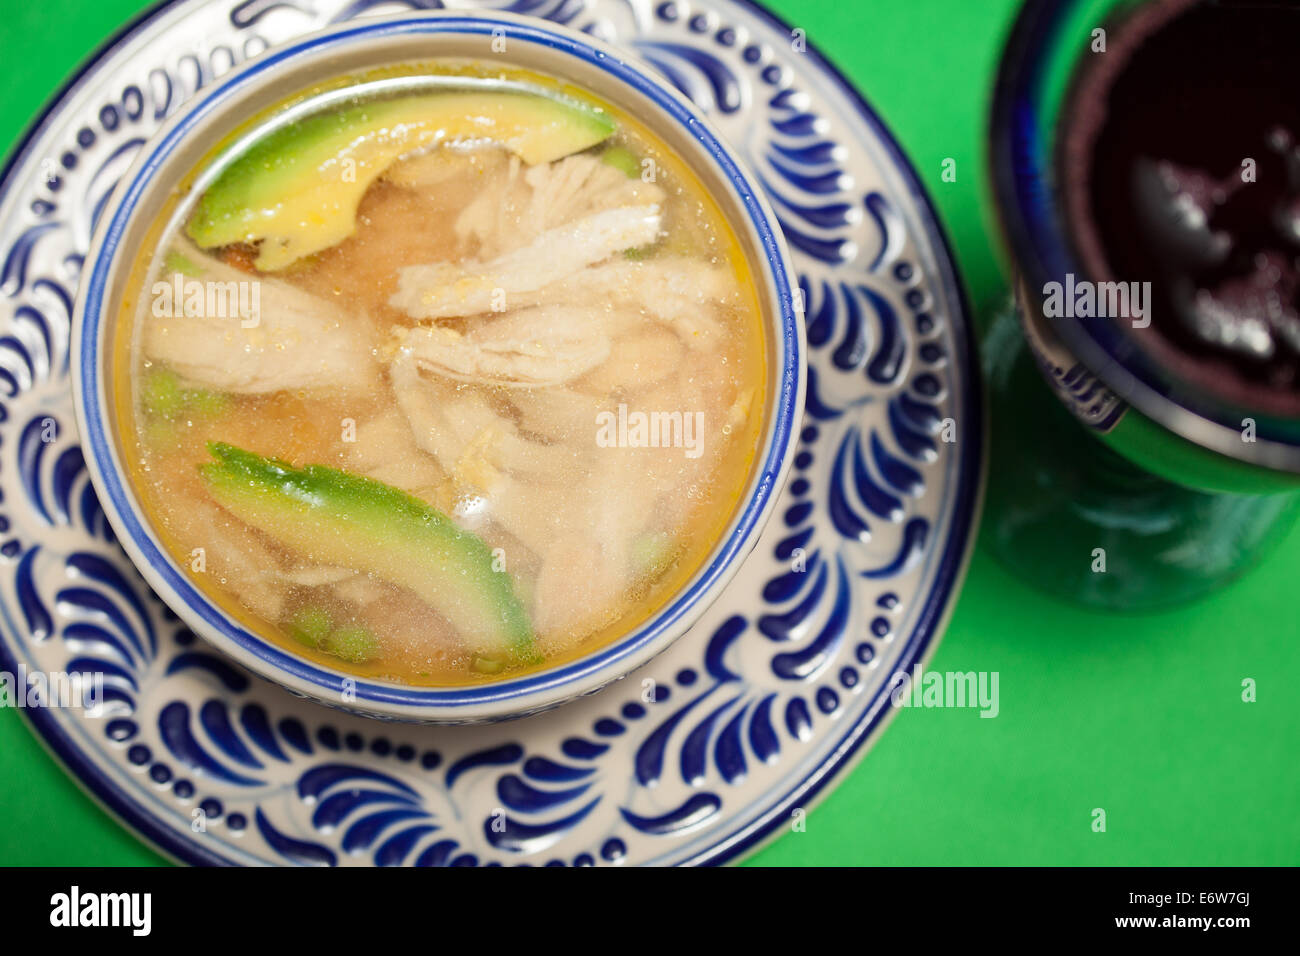 Chicken soup with avocado slices on a talavera plate in Puebla, Mexico. - Stock Image